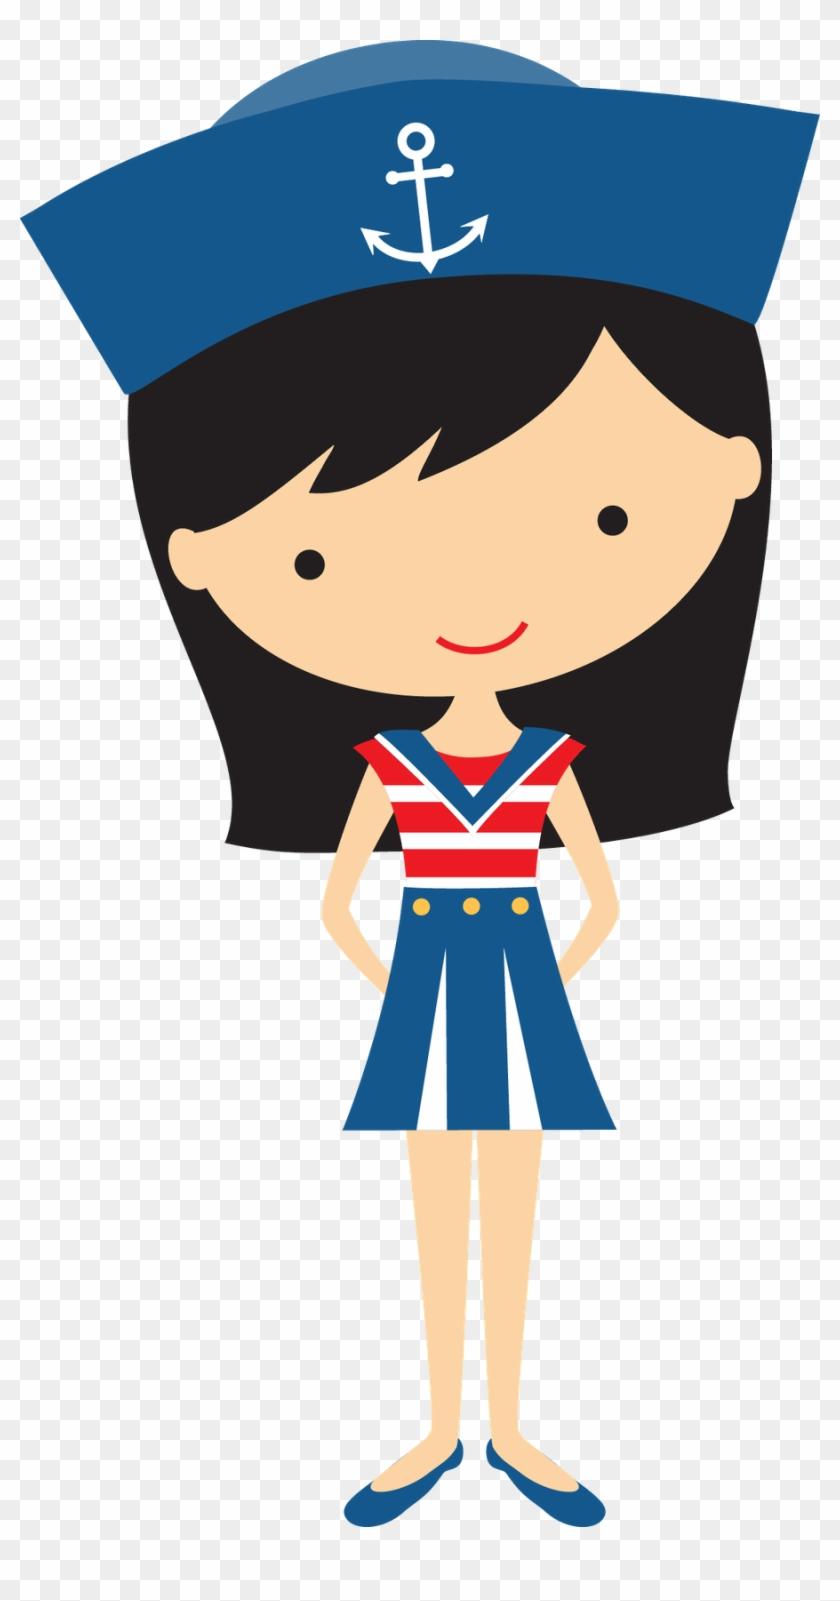 Black Haired Girl Sailor - Girl Sailor Clipart #4742